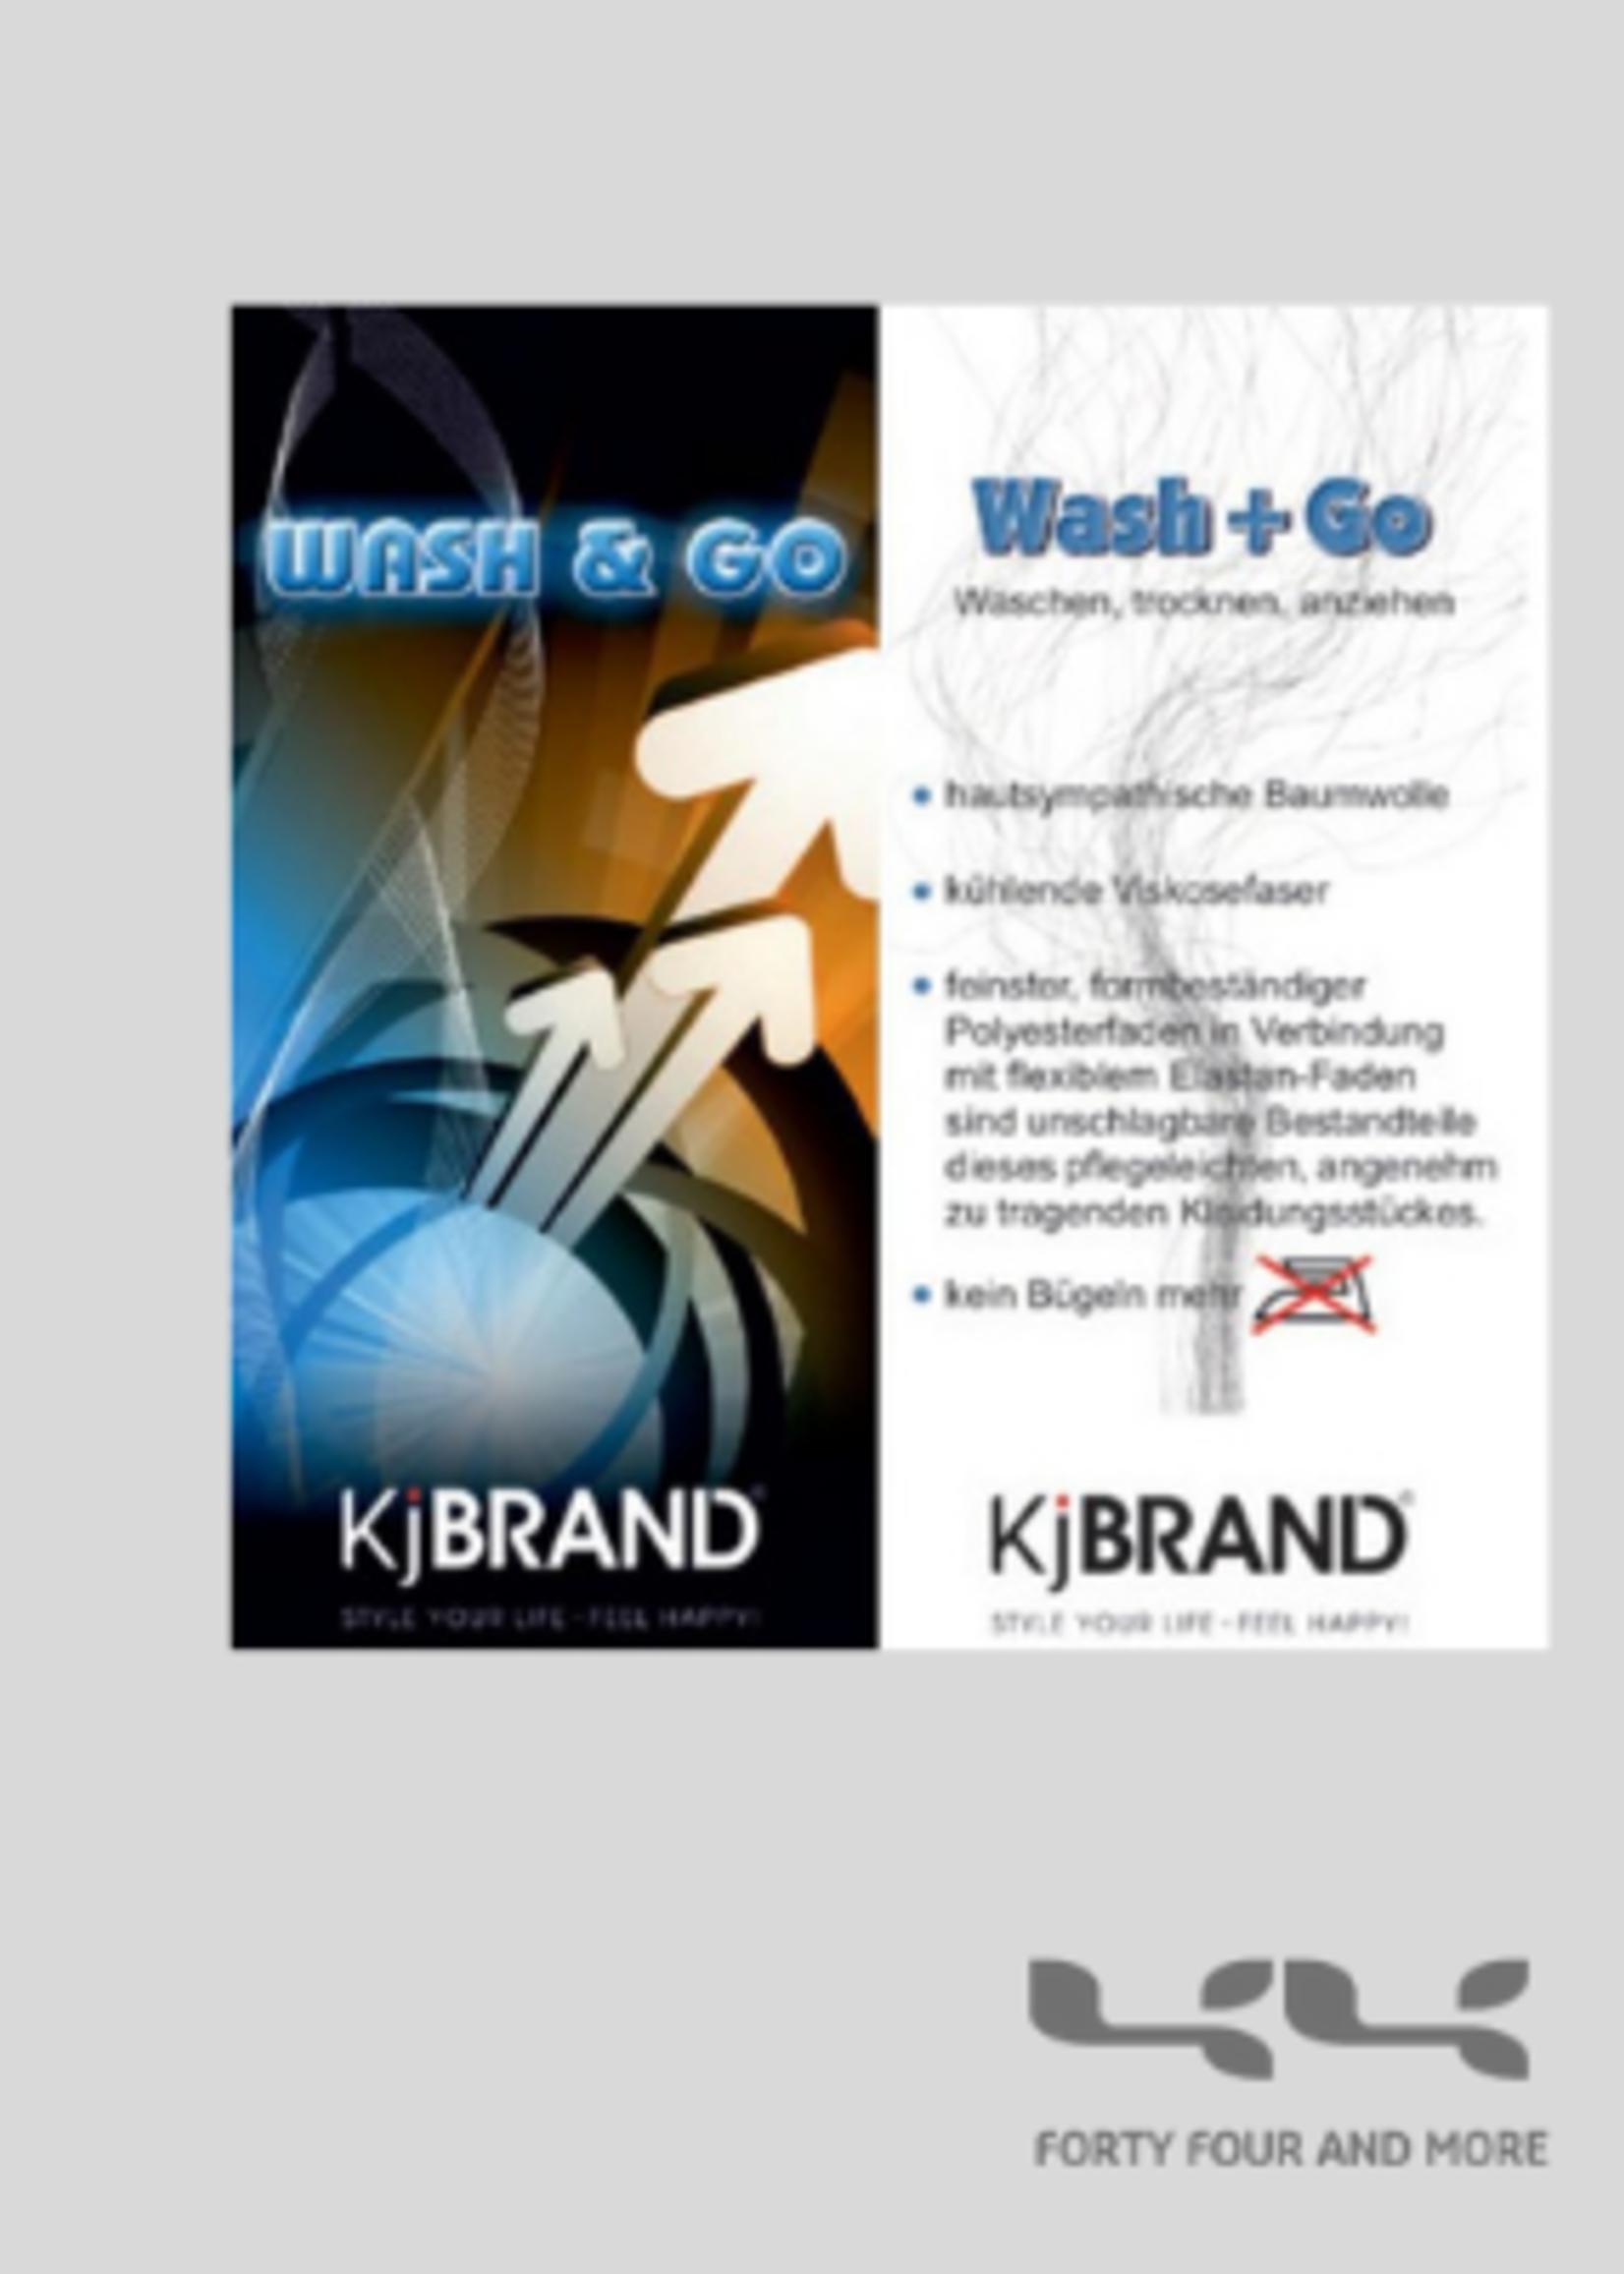 KJBrand 23020 7615 Wash 'n Go in Babsie model